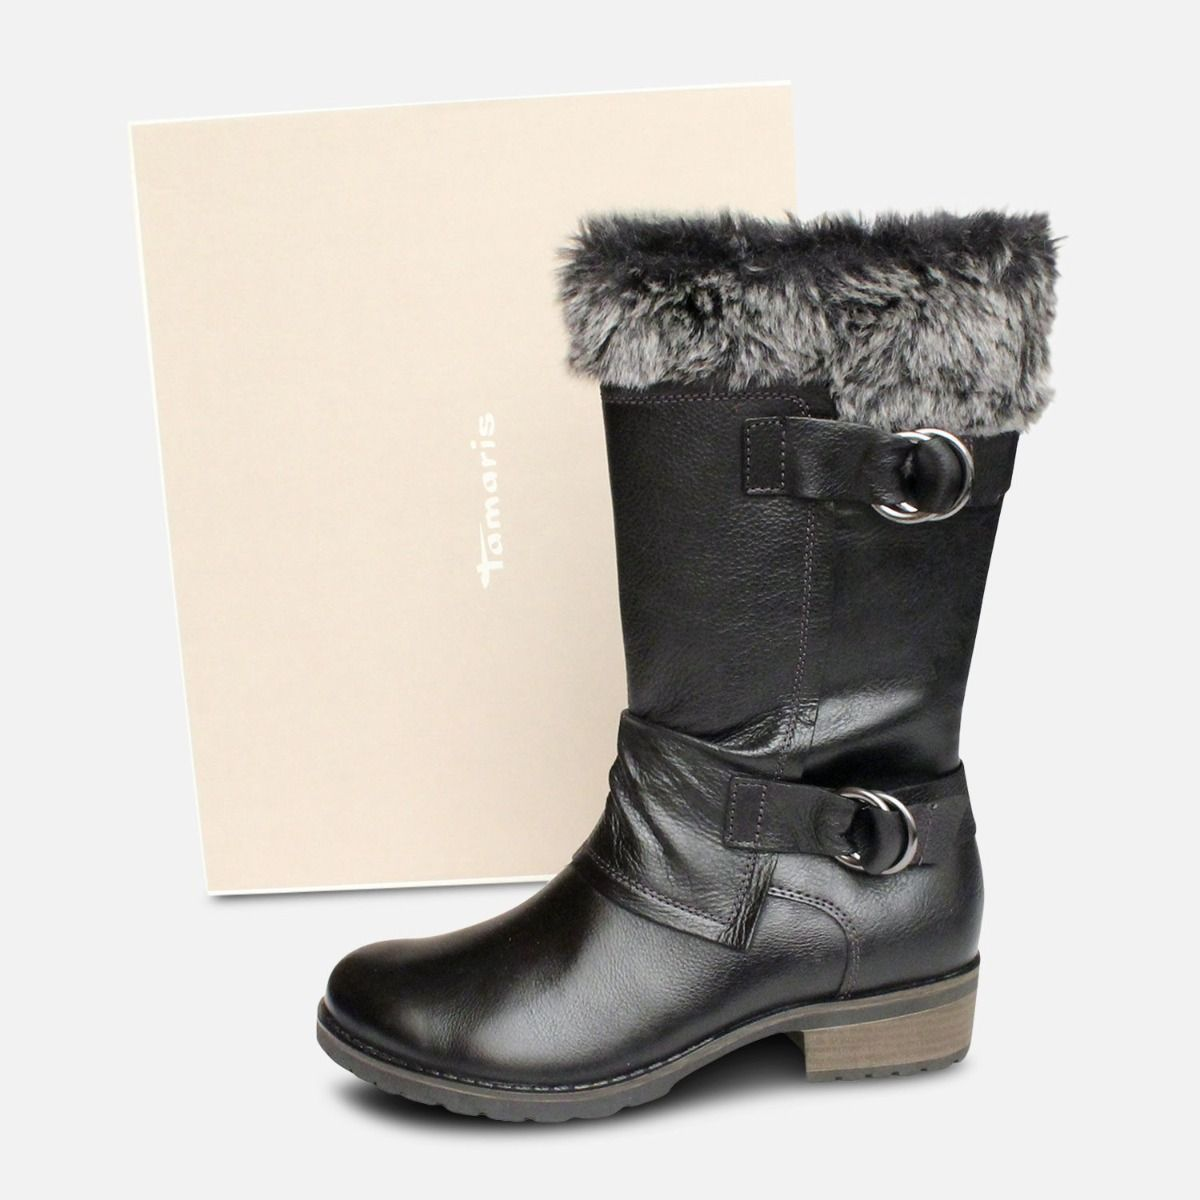 Black Ladies Side Zip Tamaris Boots with Fur Top